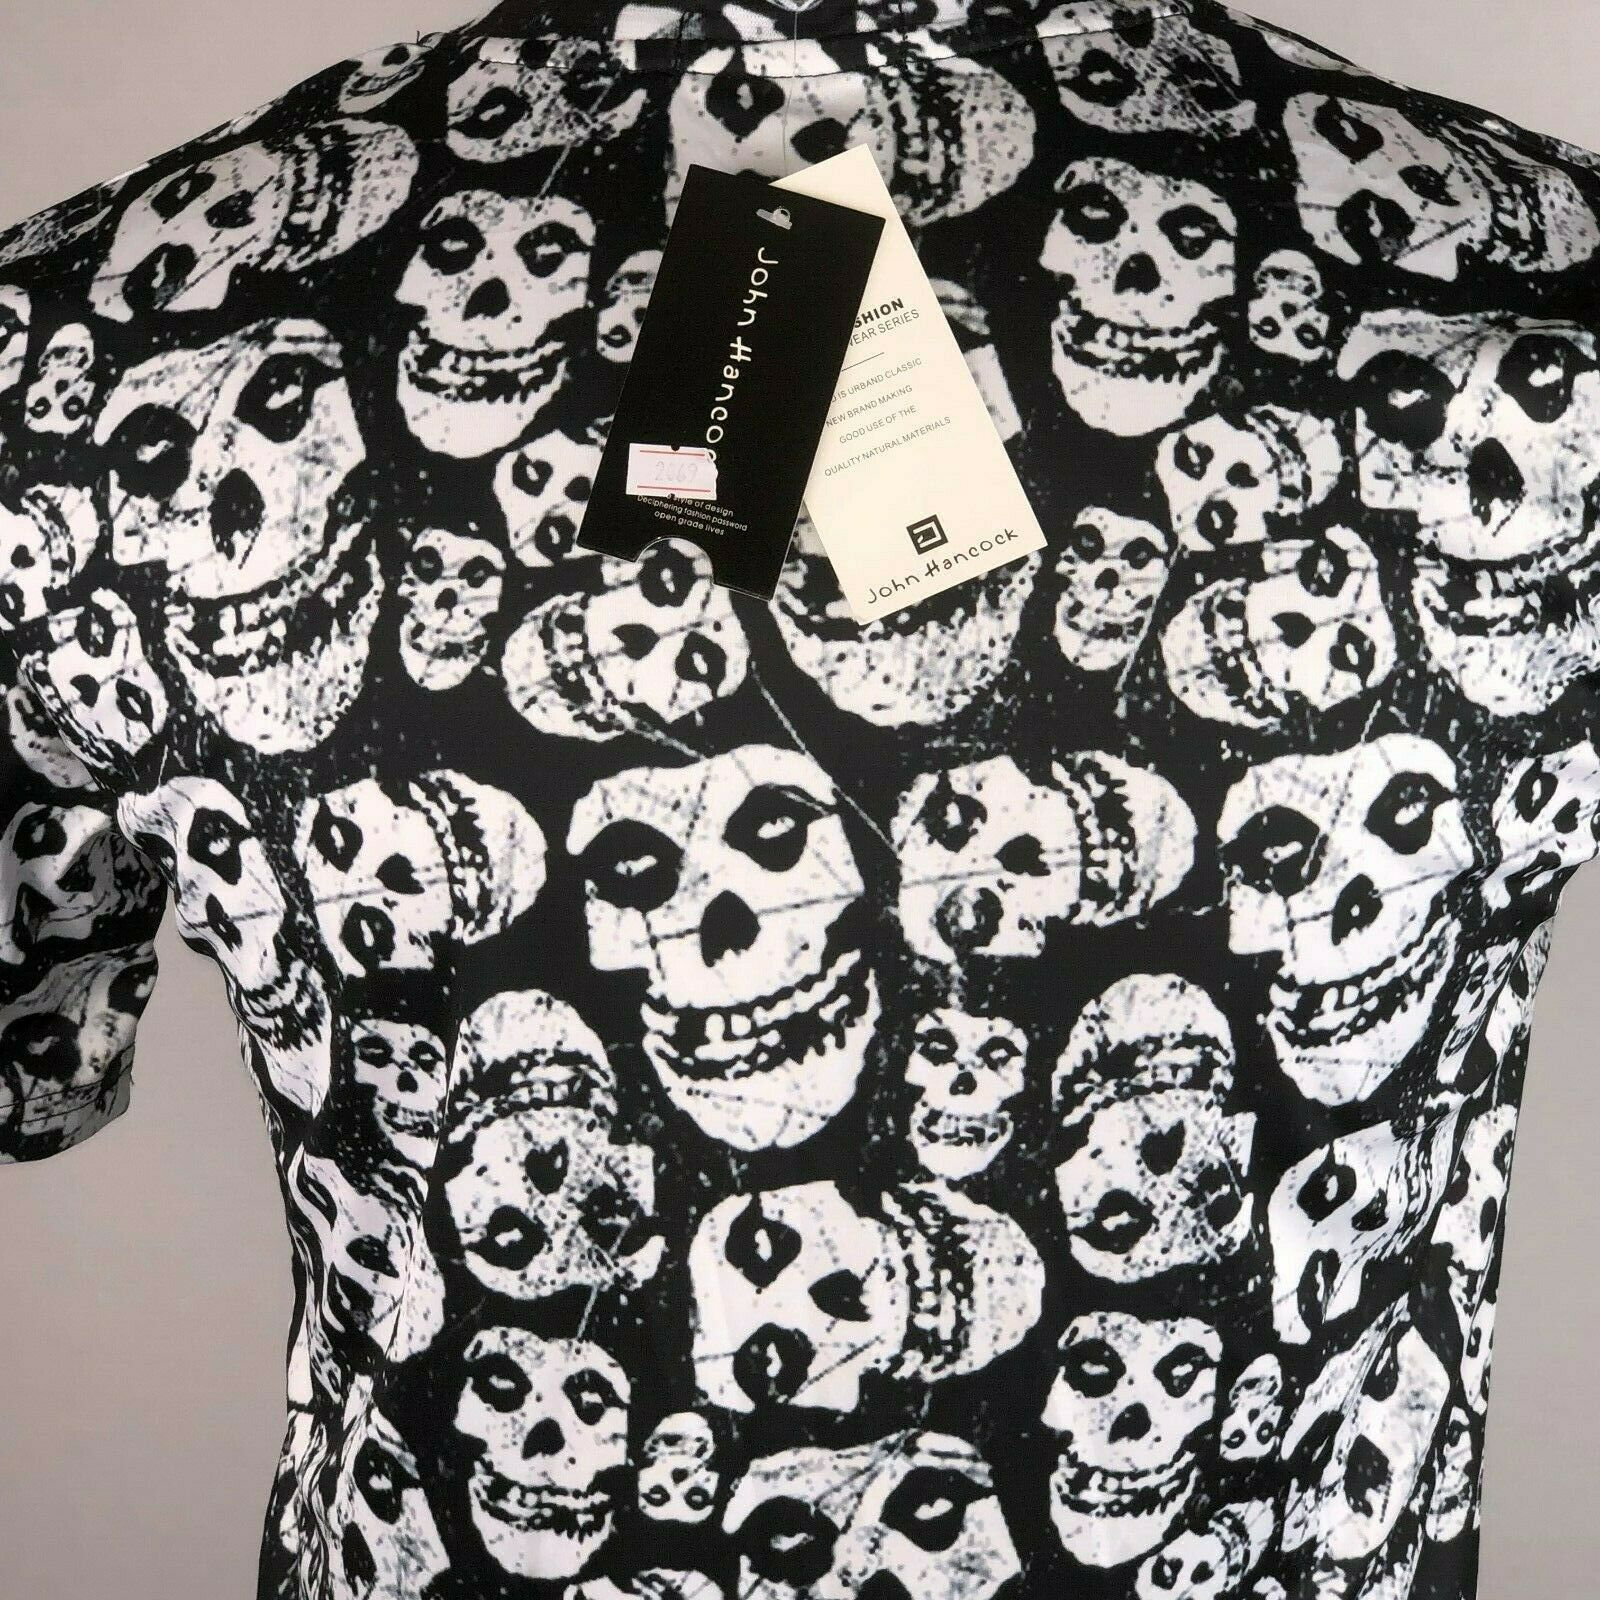 John Hancock Skull Shirt NWT Mens Graphic Tee